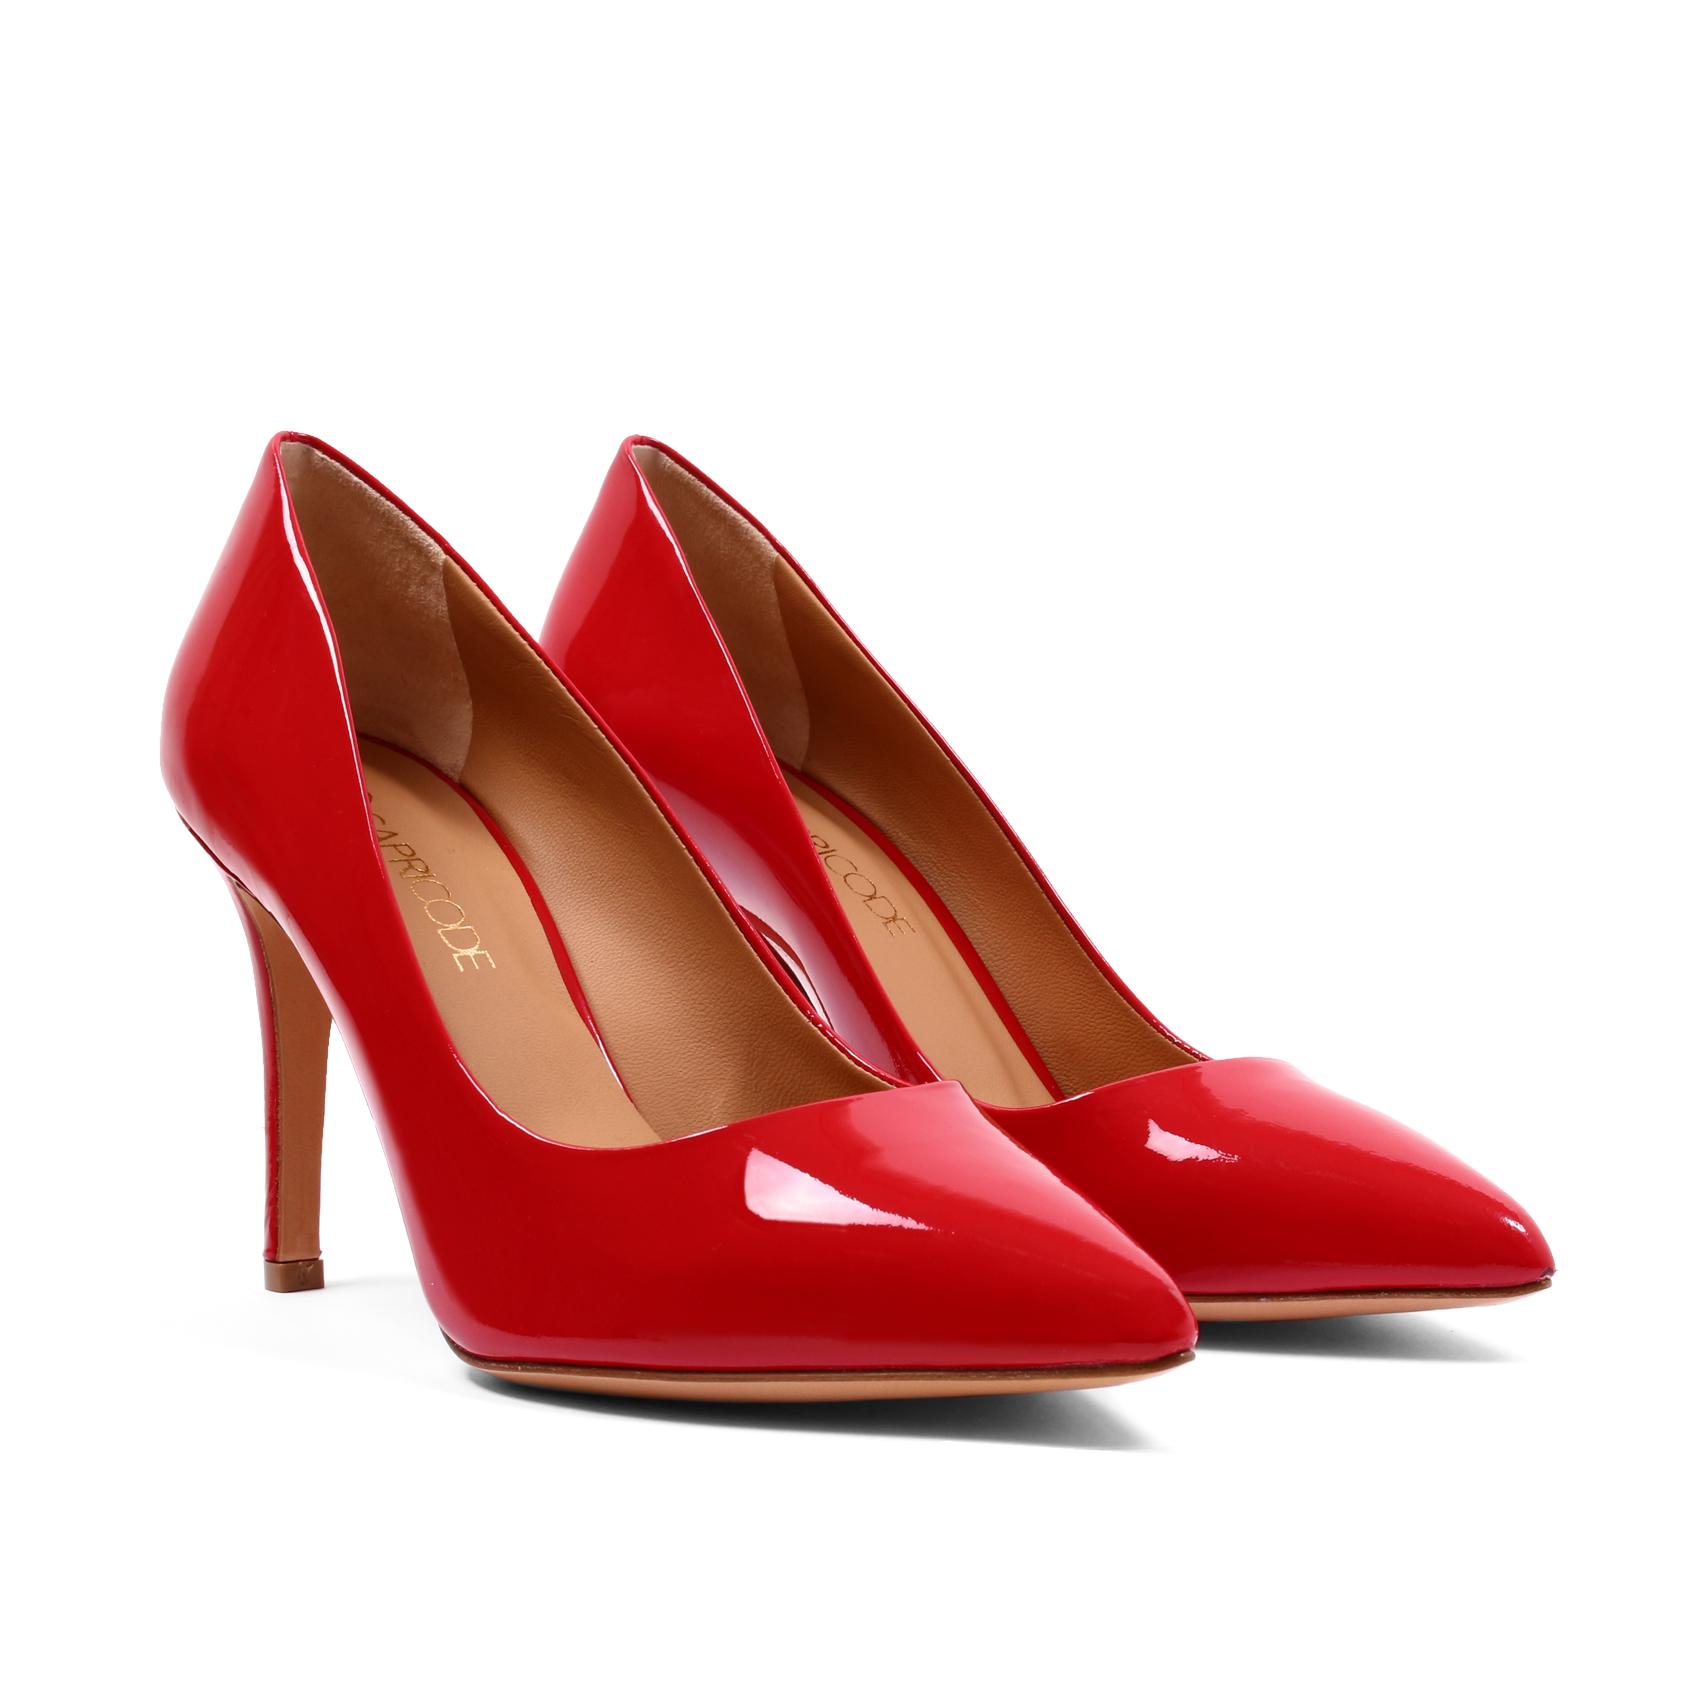 Rossa Vernice C